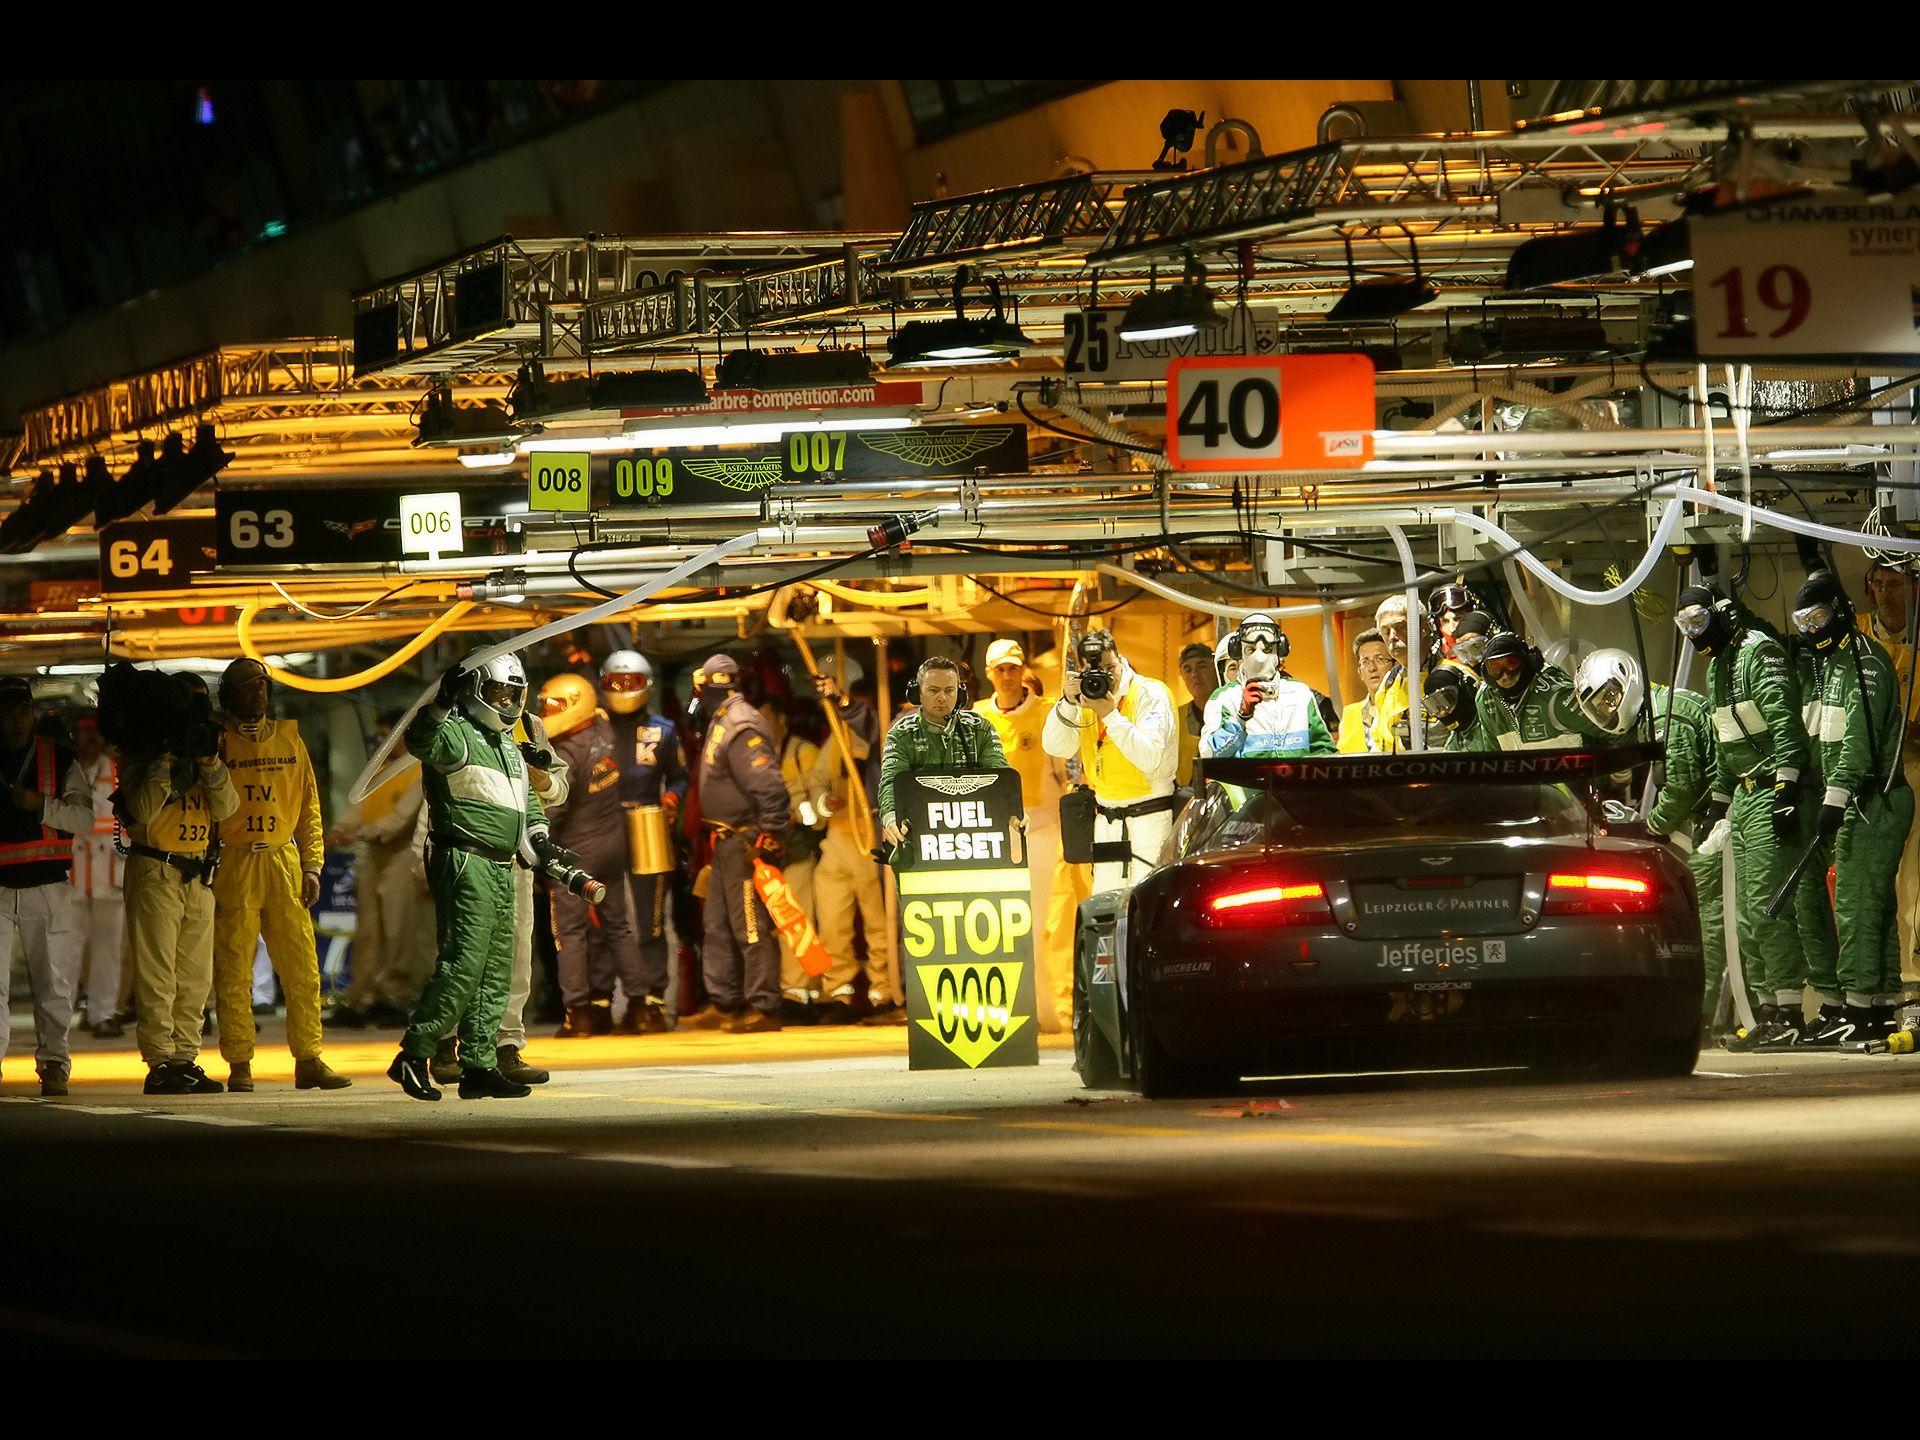 2007 Aston Martin Dbr9 Le Mans Winner Pit Stop Night Rear 1920x1440 Wallpaper Aston Martin Dbr9 Aston Martin Le Mans